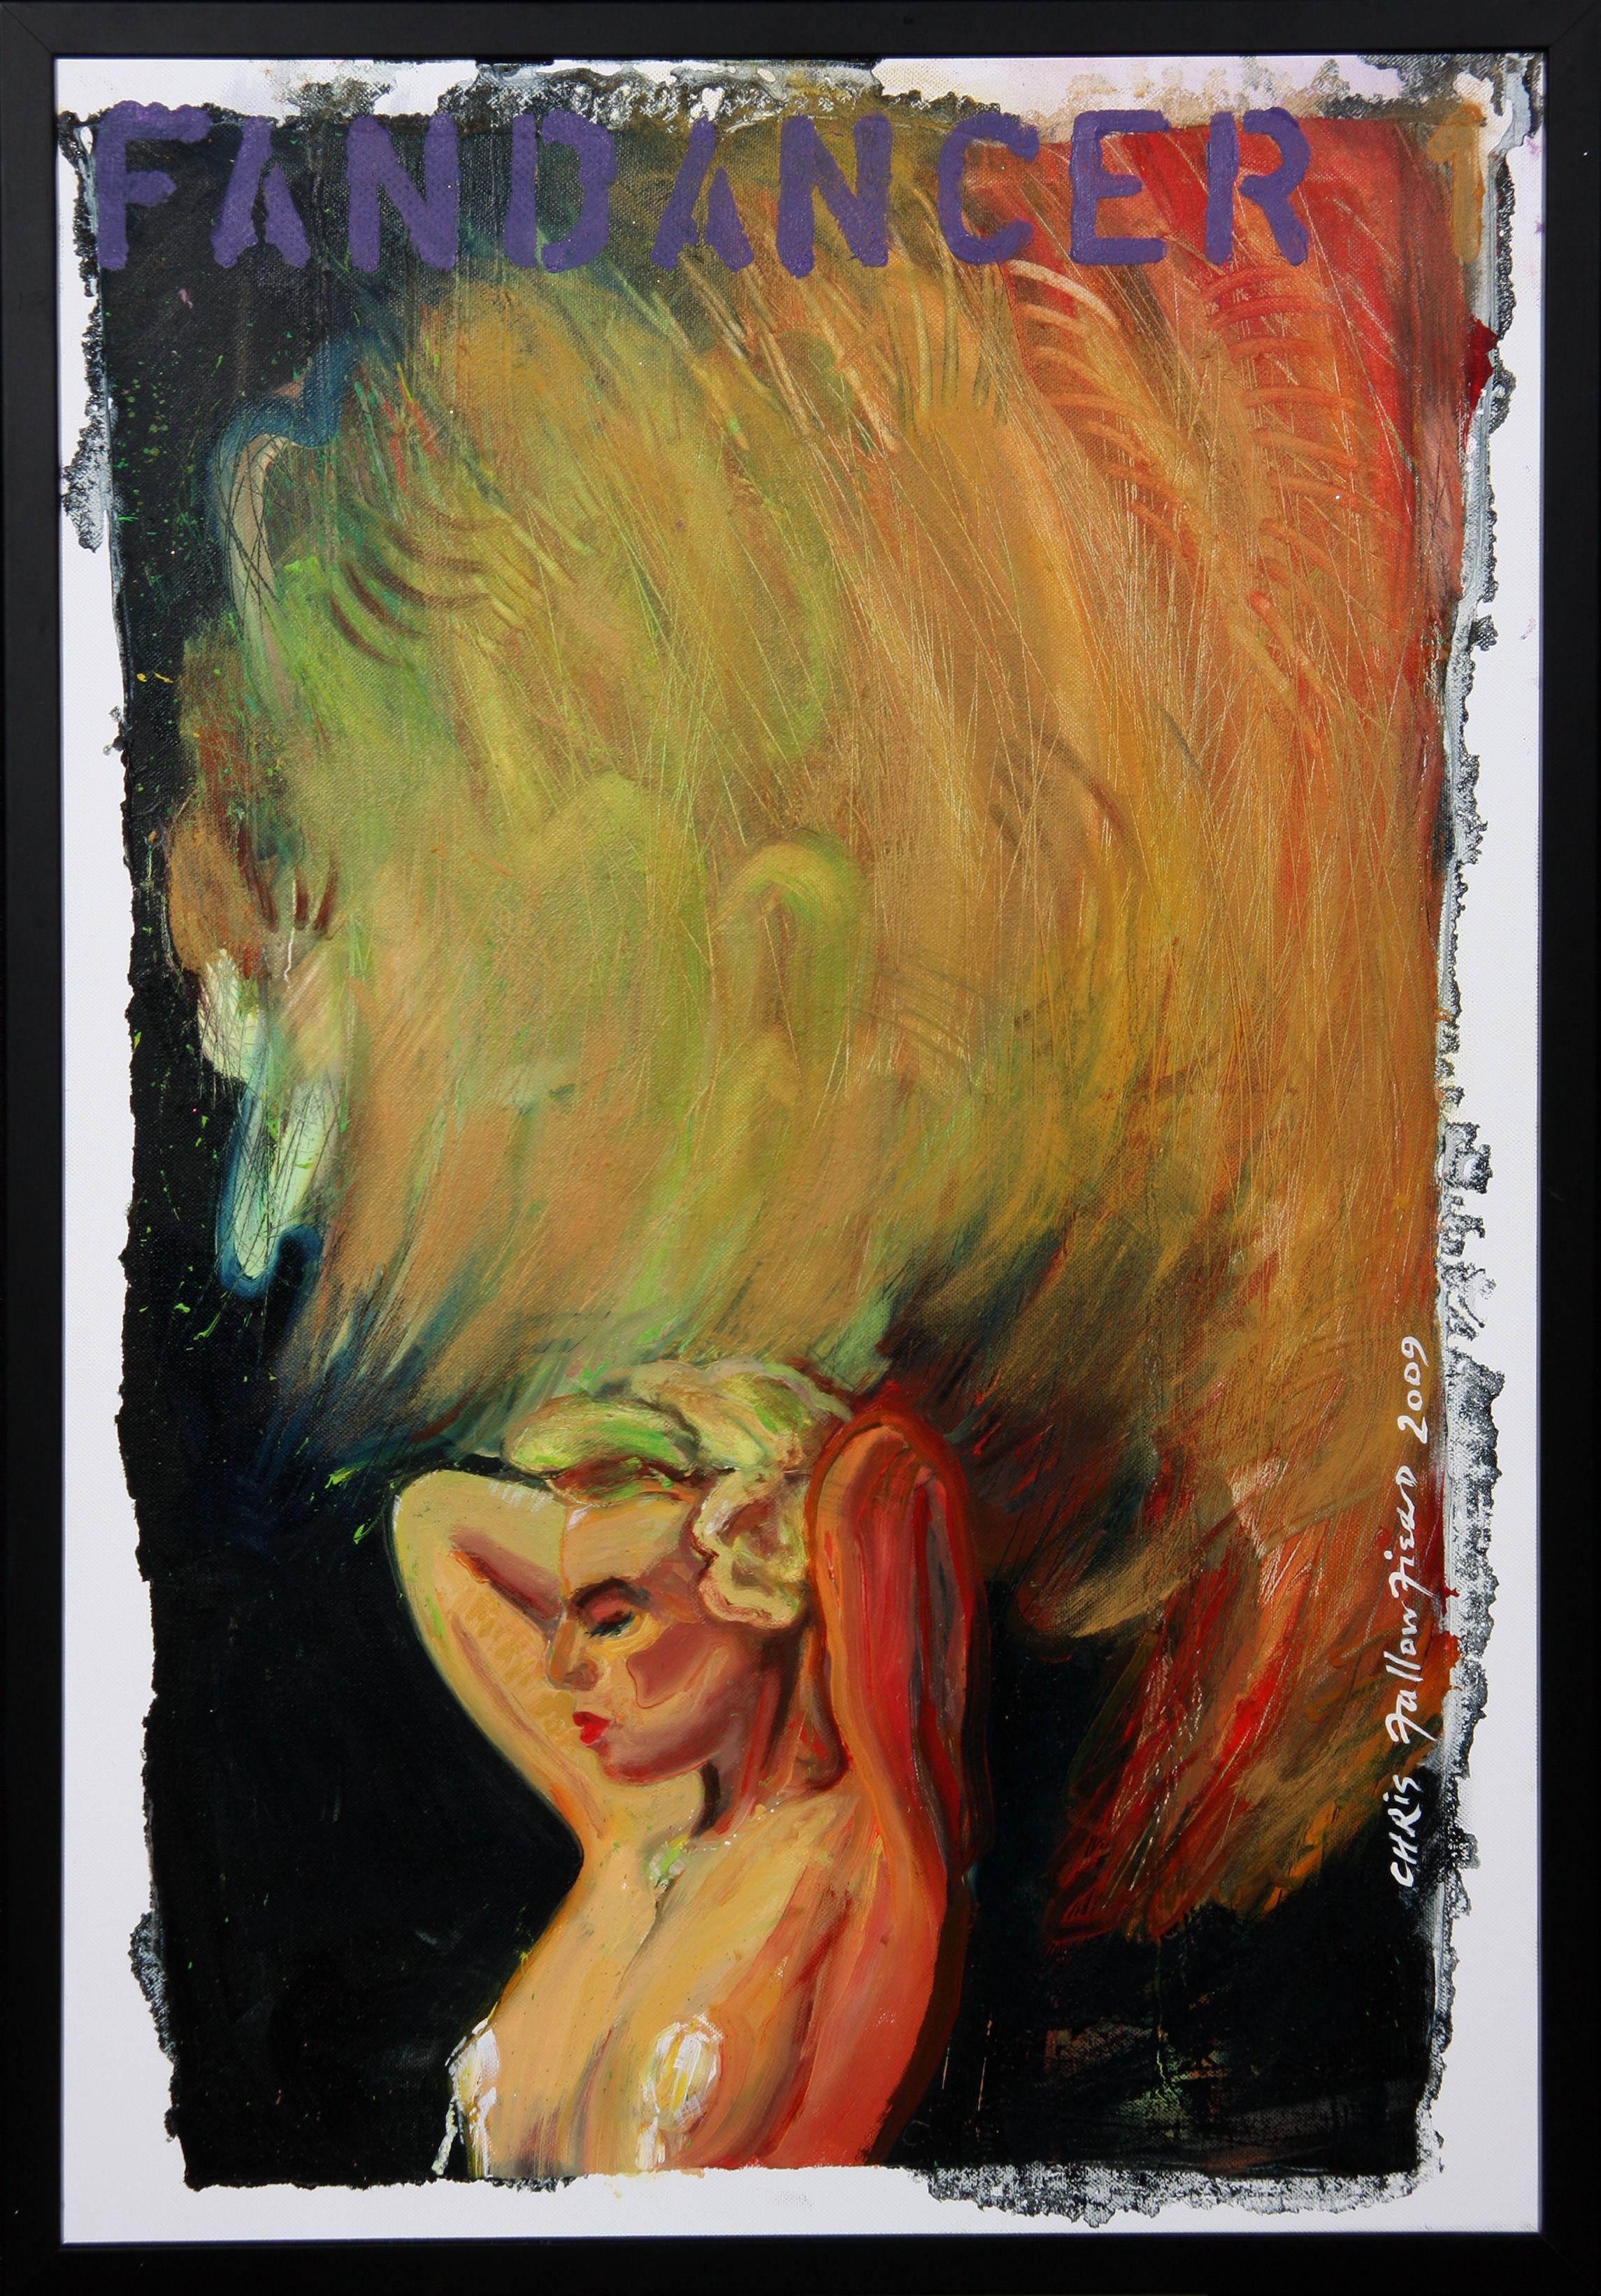 Chris F: FANDANCER 1 oil on canvas